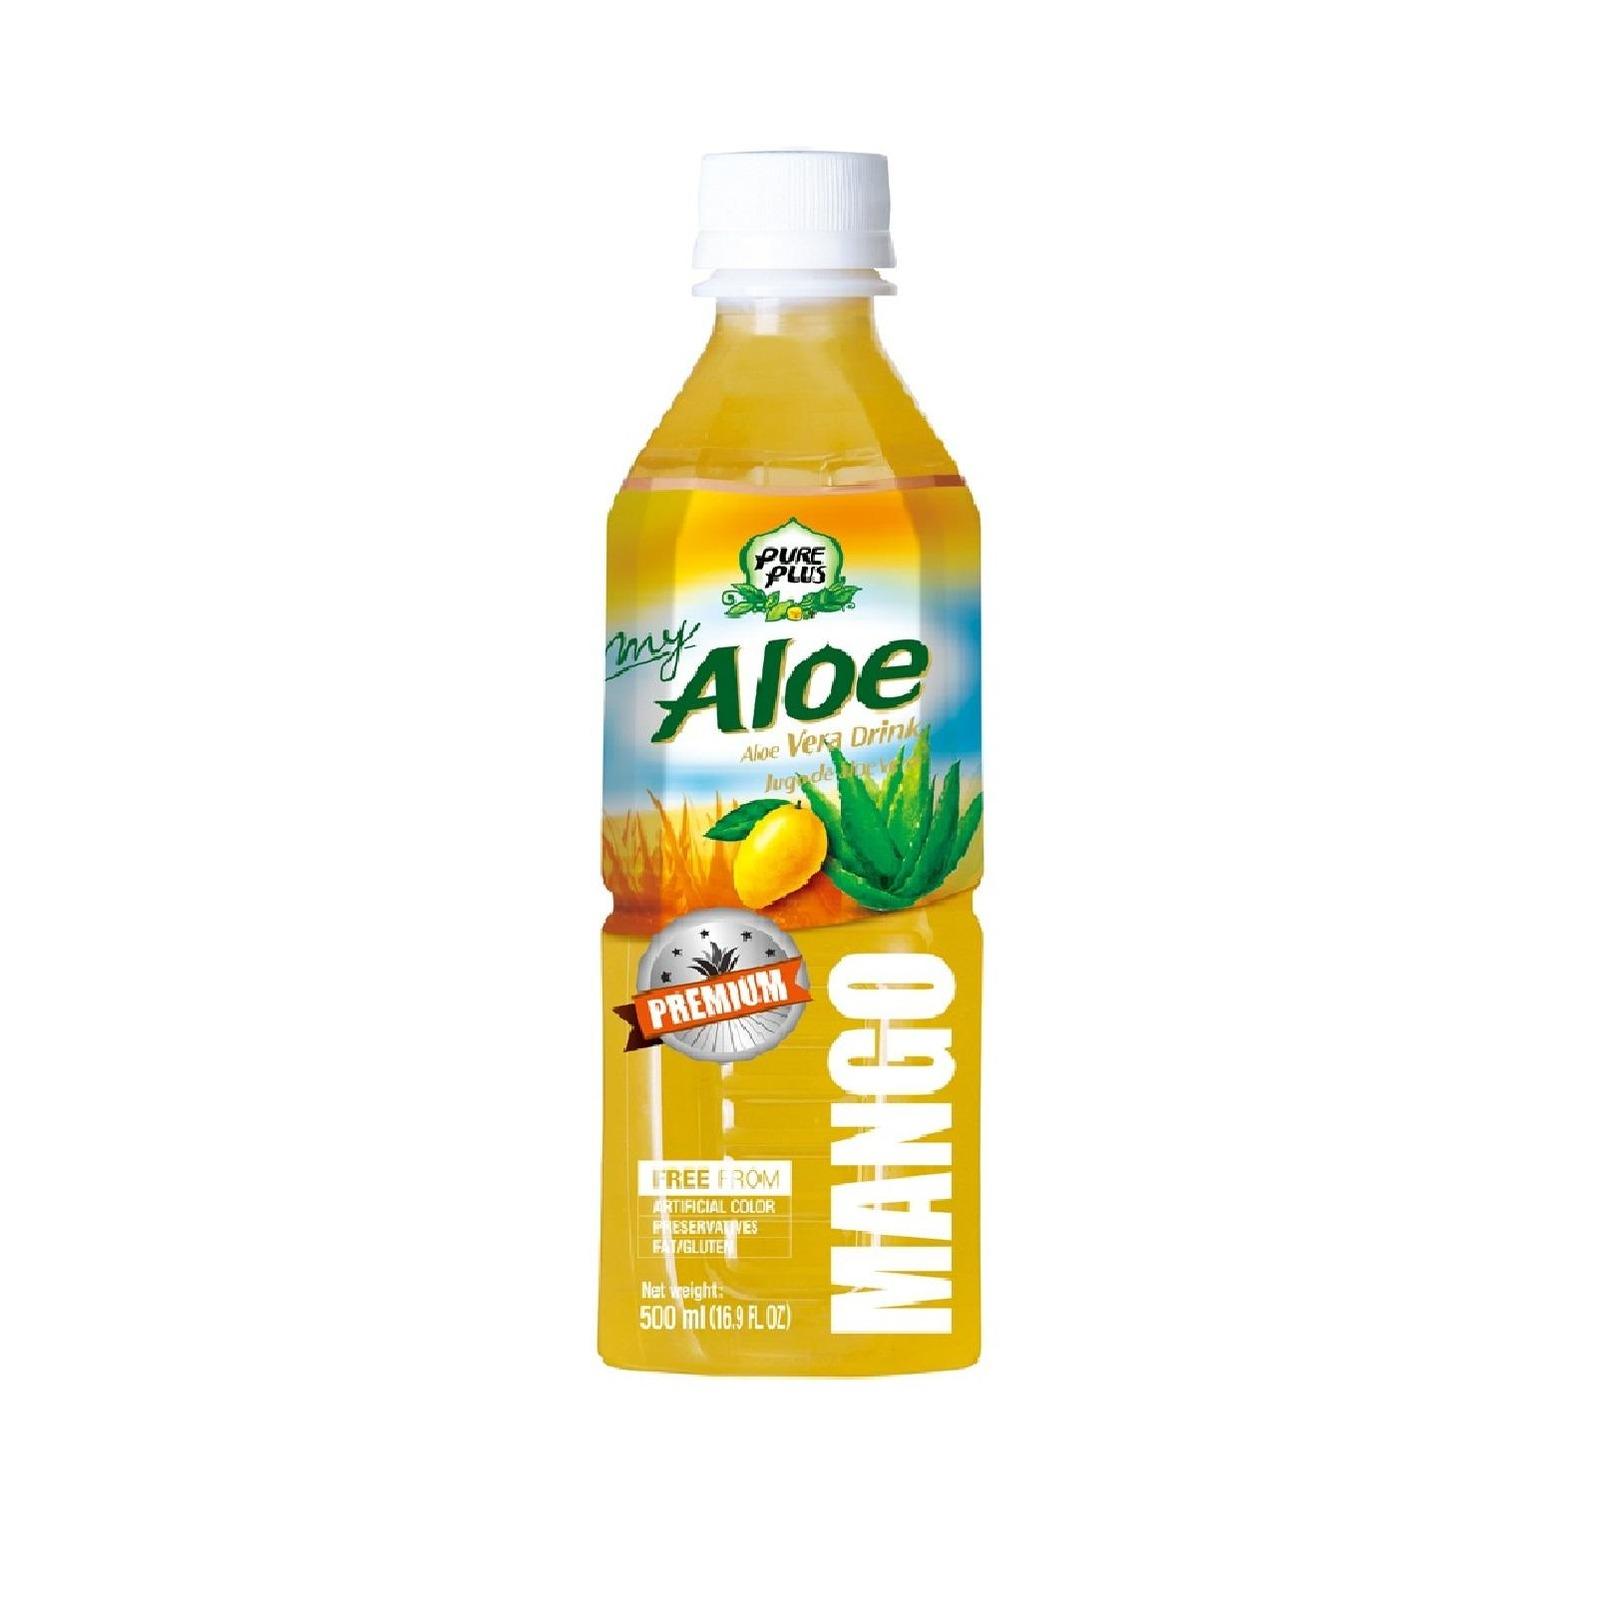 PurePlus My Aloe Mango Drink - By Sonnamera